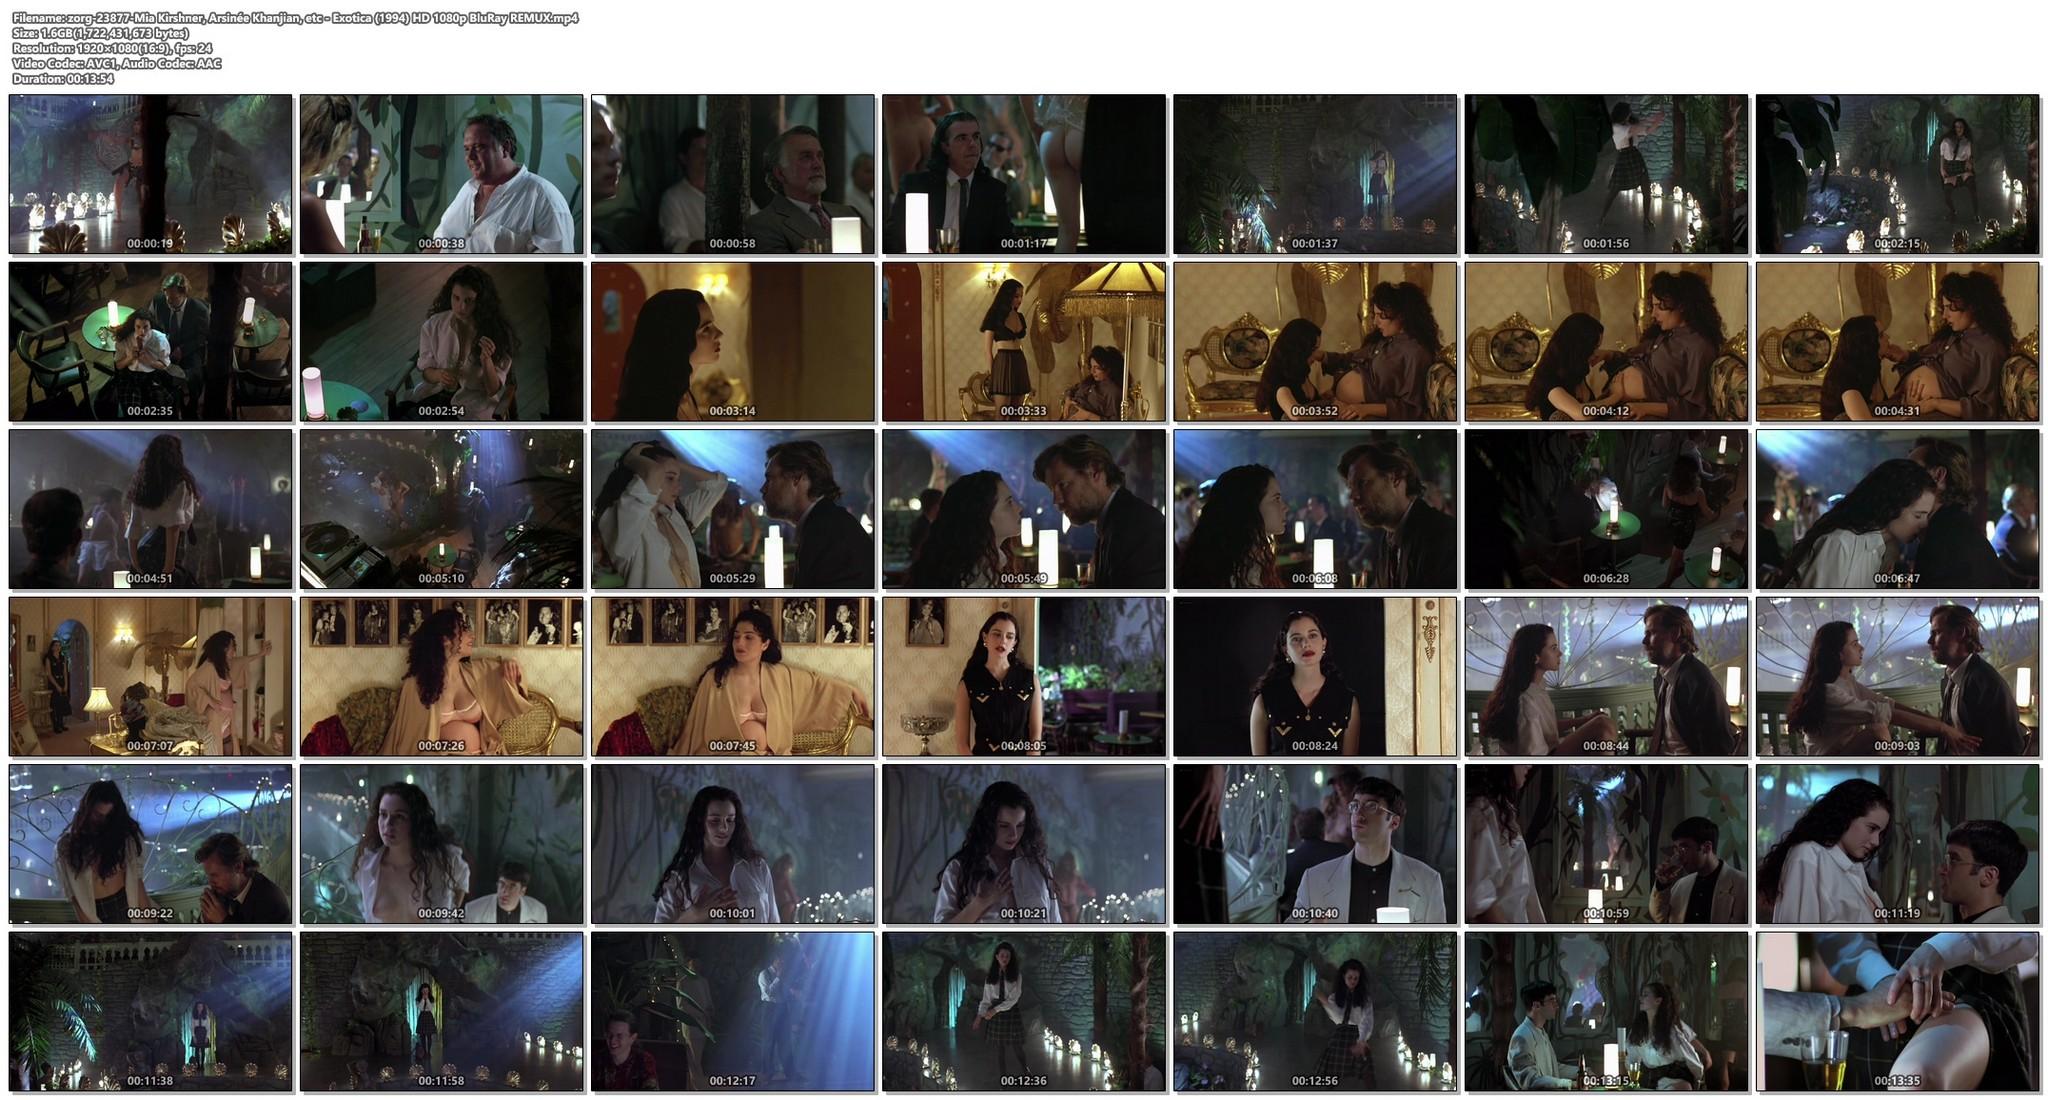 Mia Kirshner nude Arsinée Khanjian sexy - Exotica (1994) HD 1080p BluRay REMUX (1)